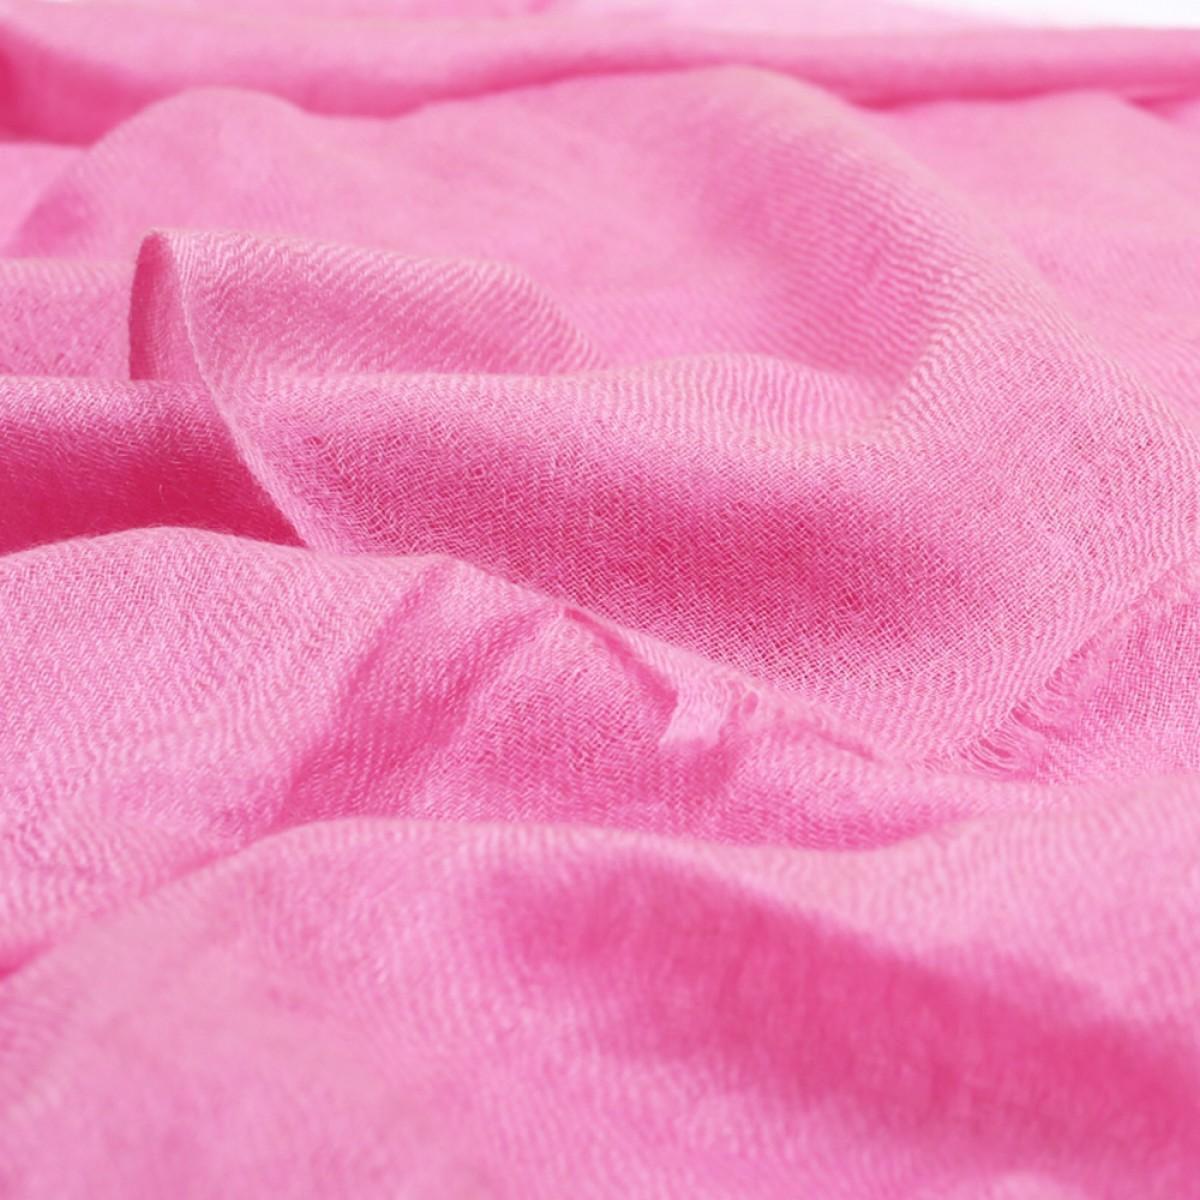 Sheer Pashmina Scarf - Peony Pink